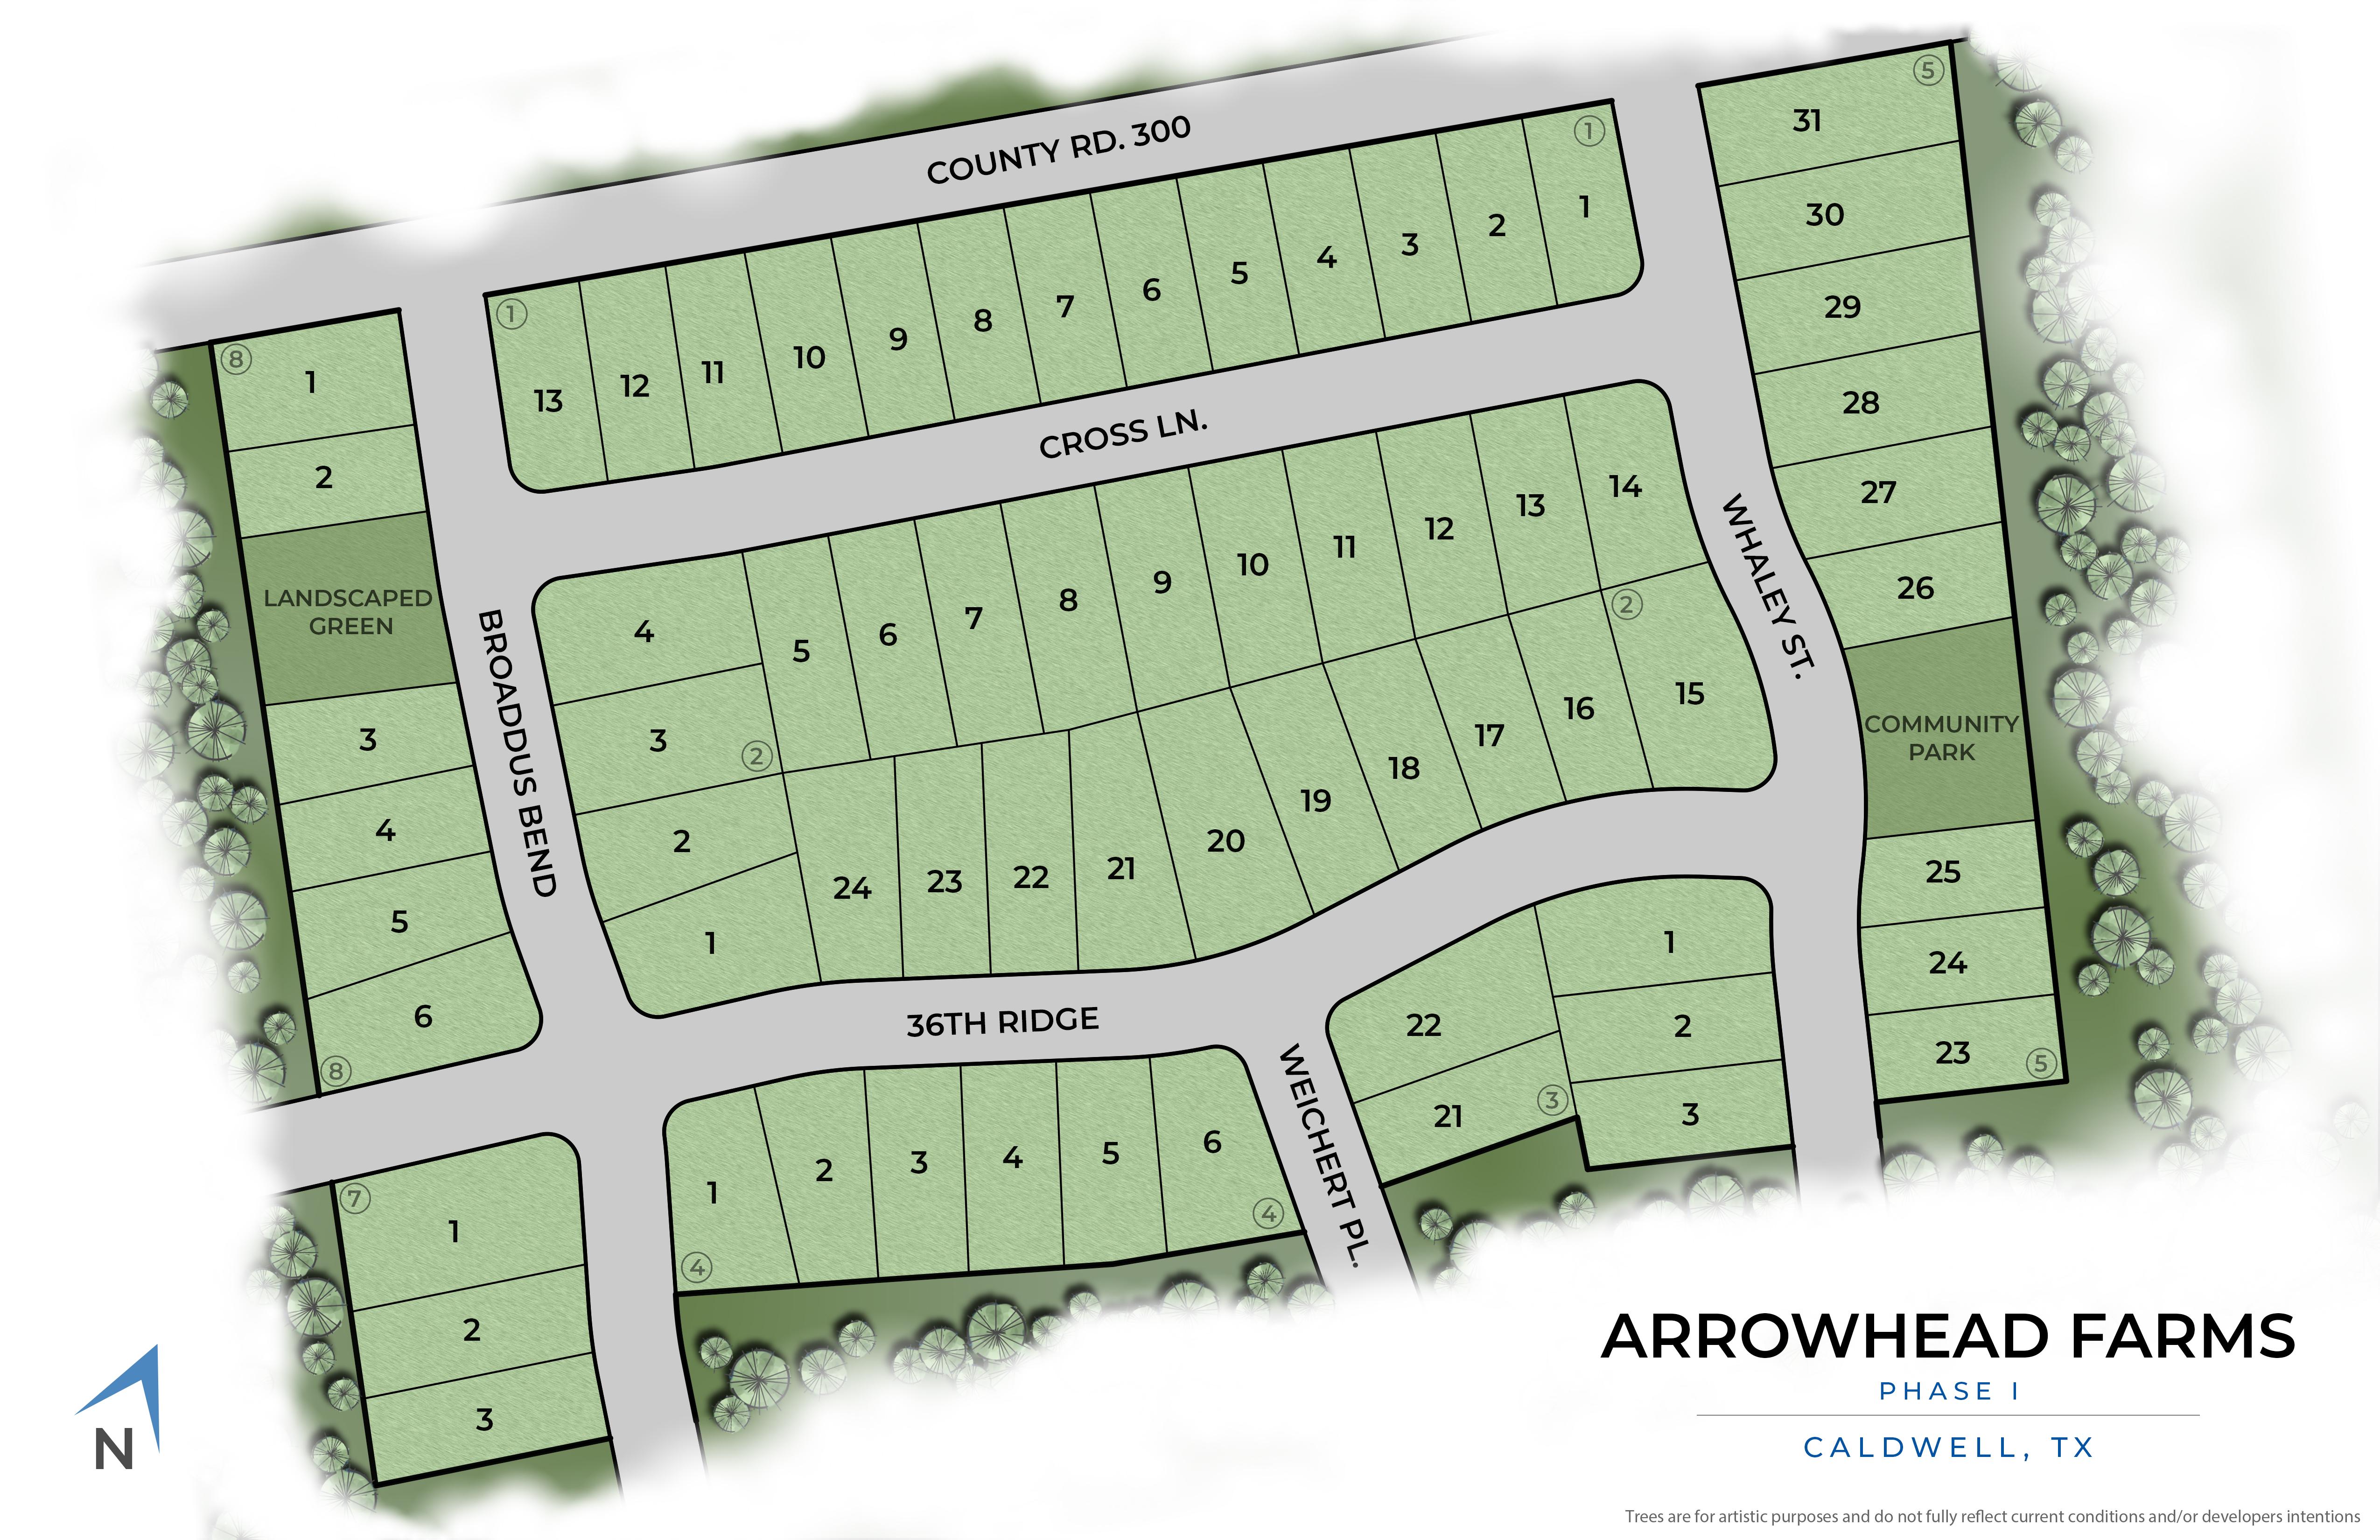 Caldwell, TX Arrowhead Farms New Homes from Stylecraft Builders